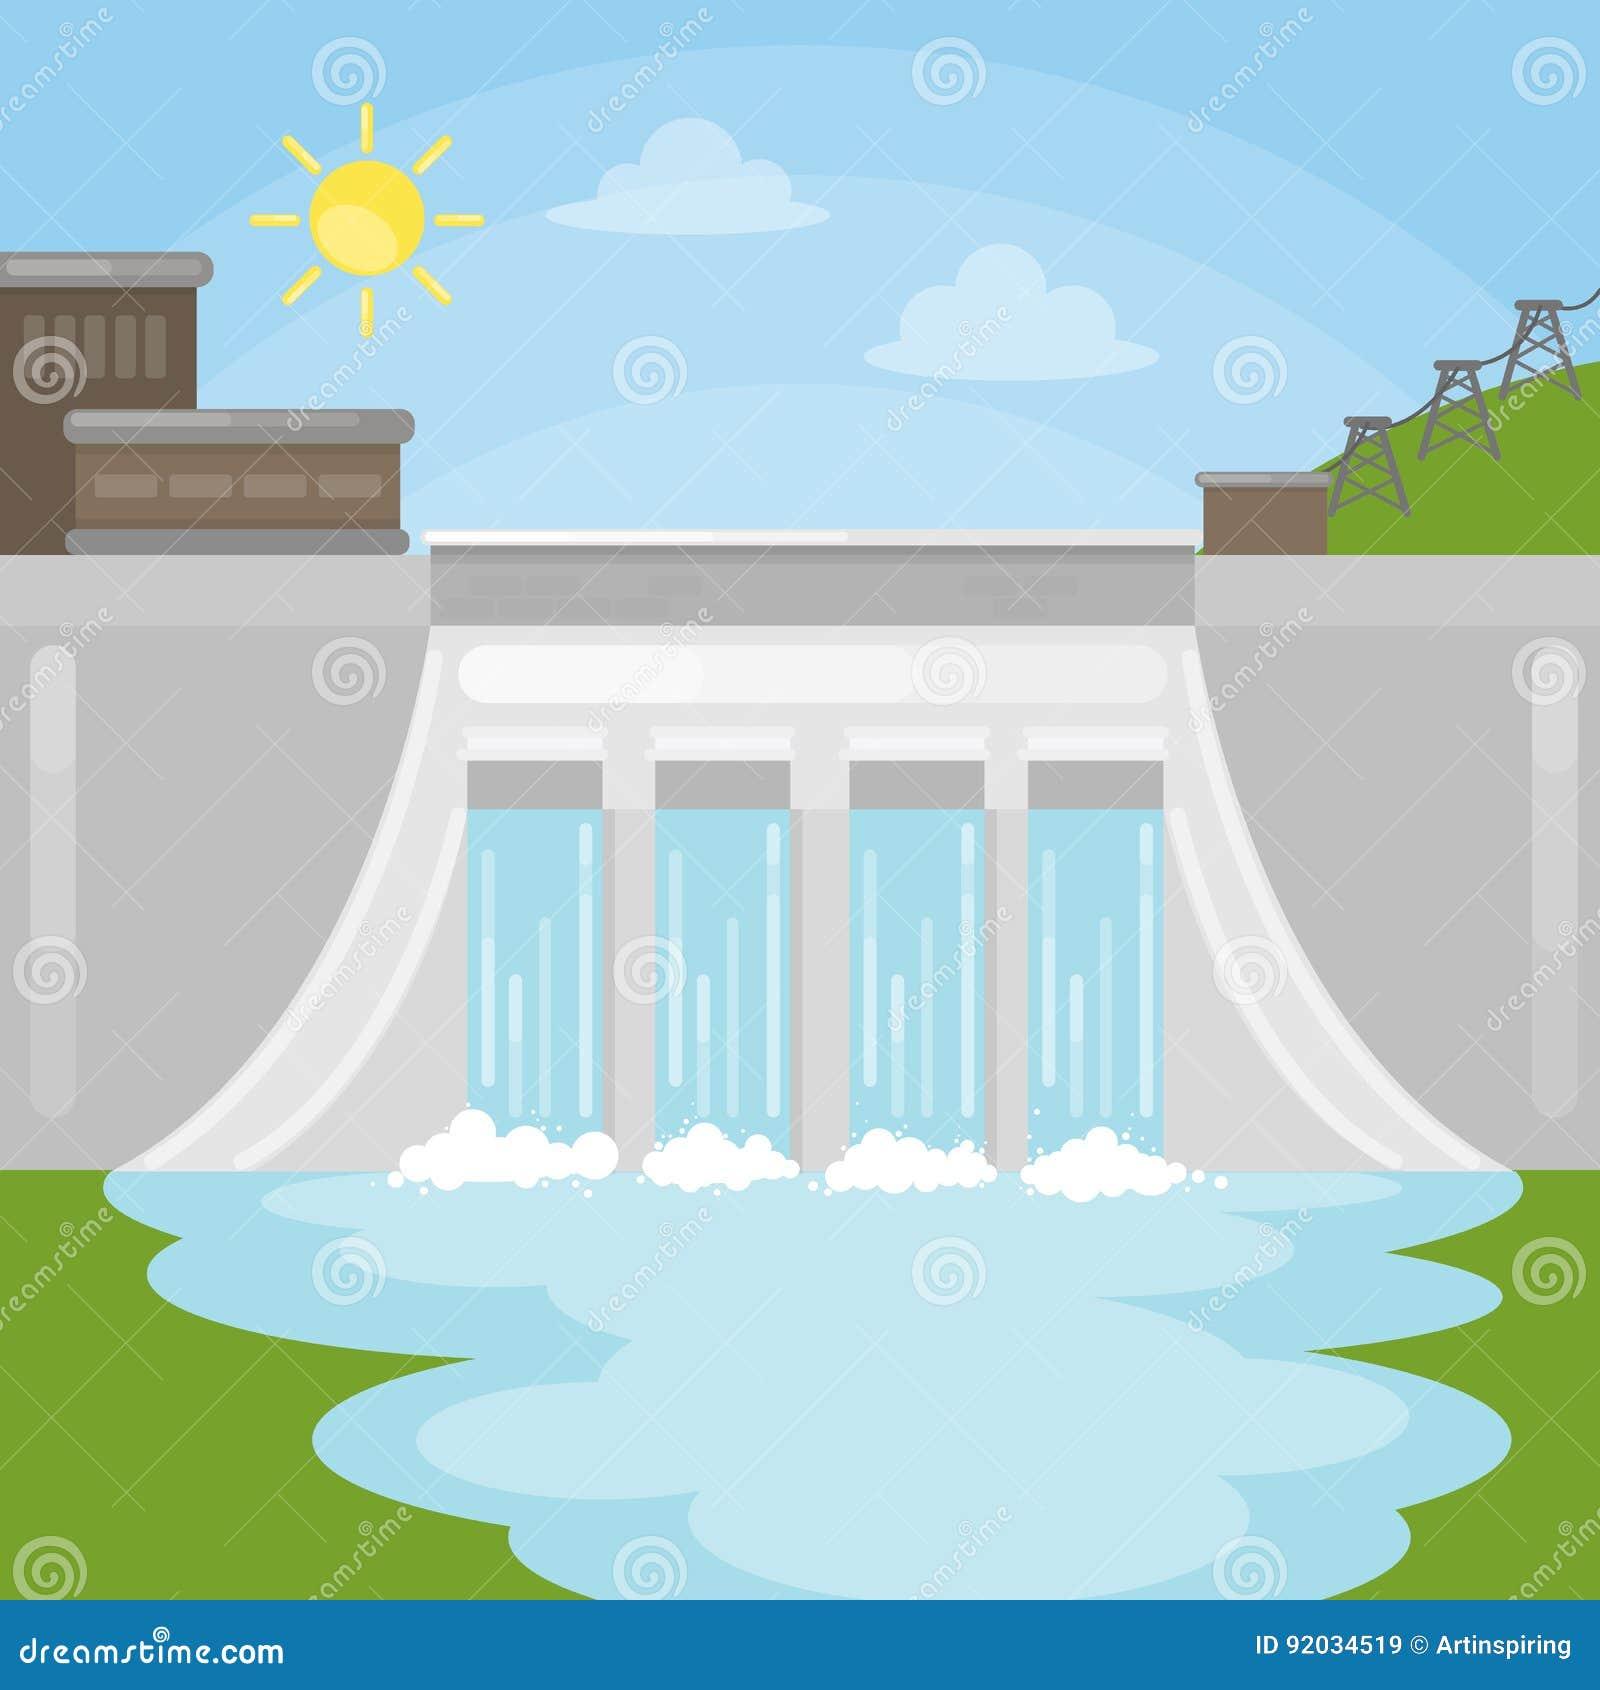 hydropower dam illustration stock vector illustration of